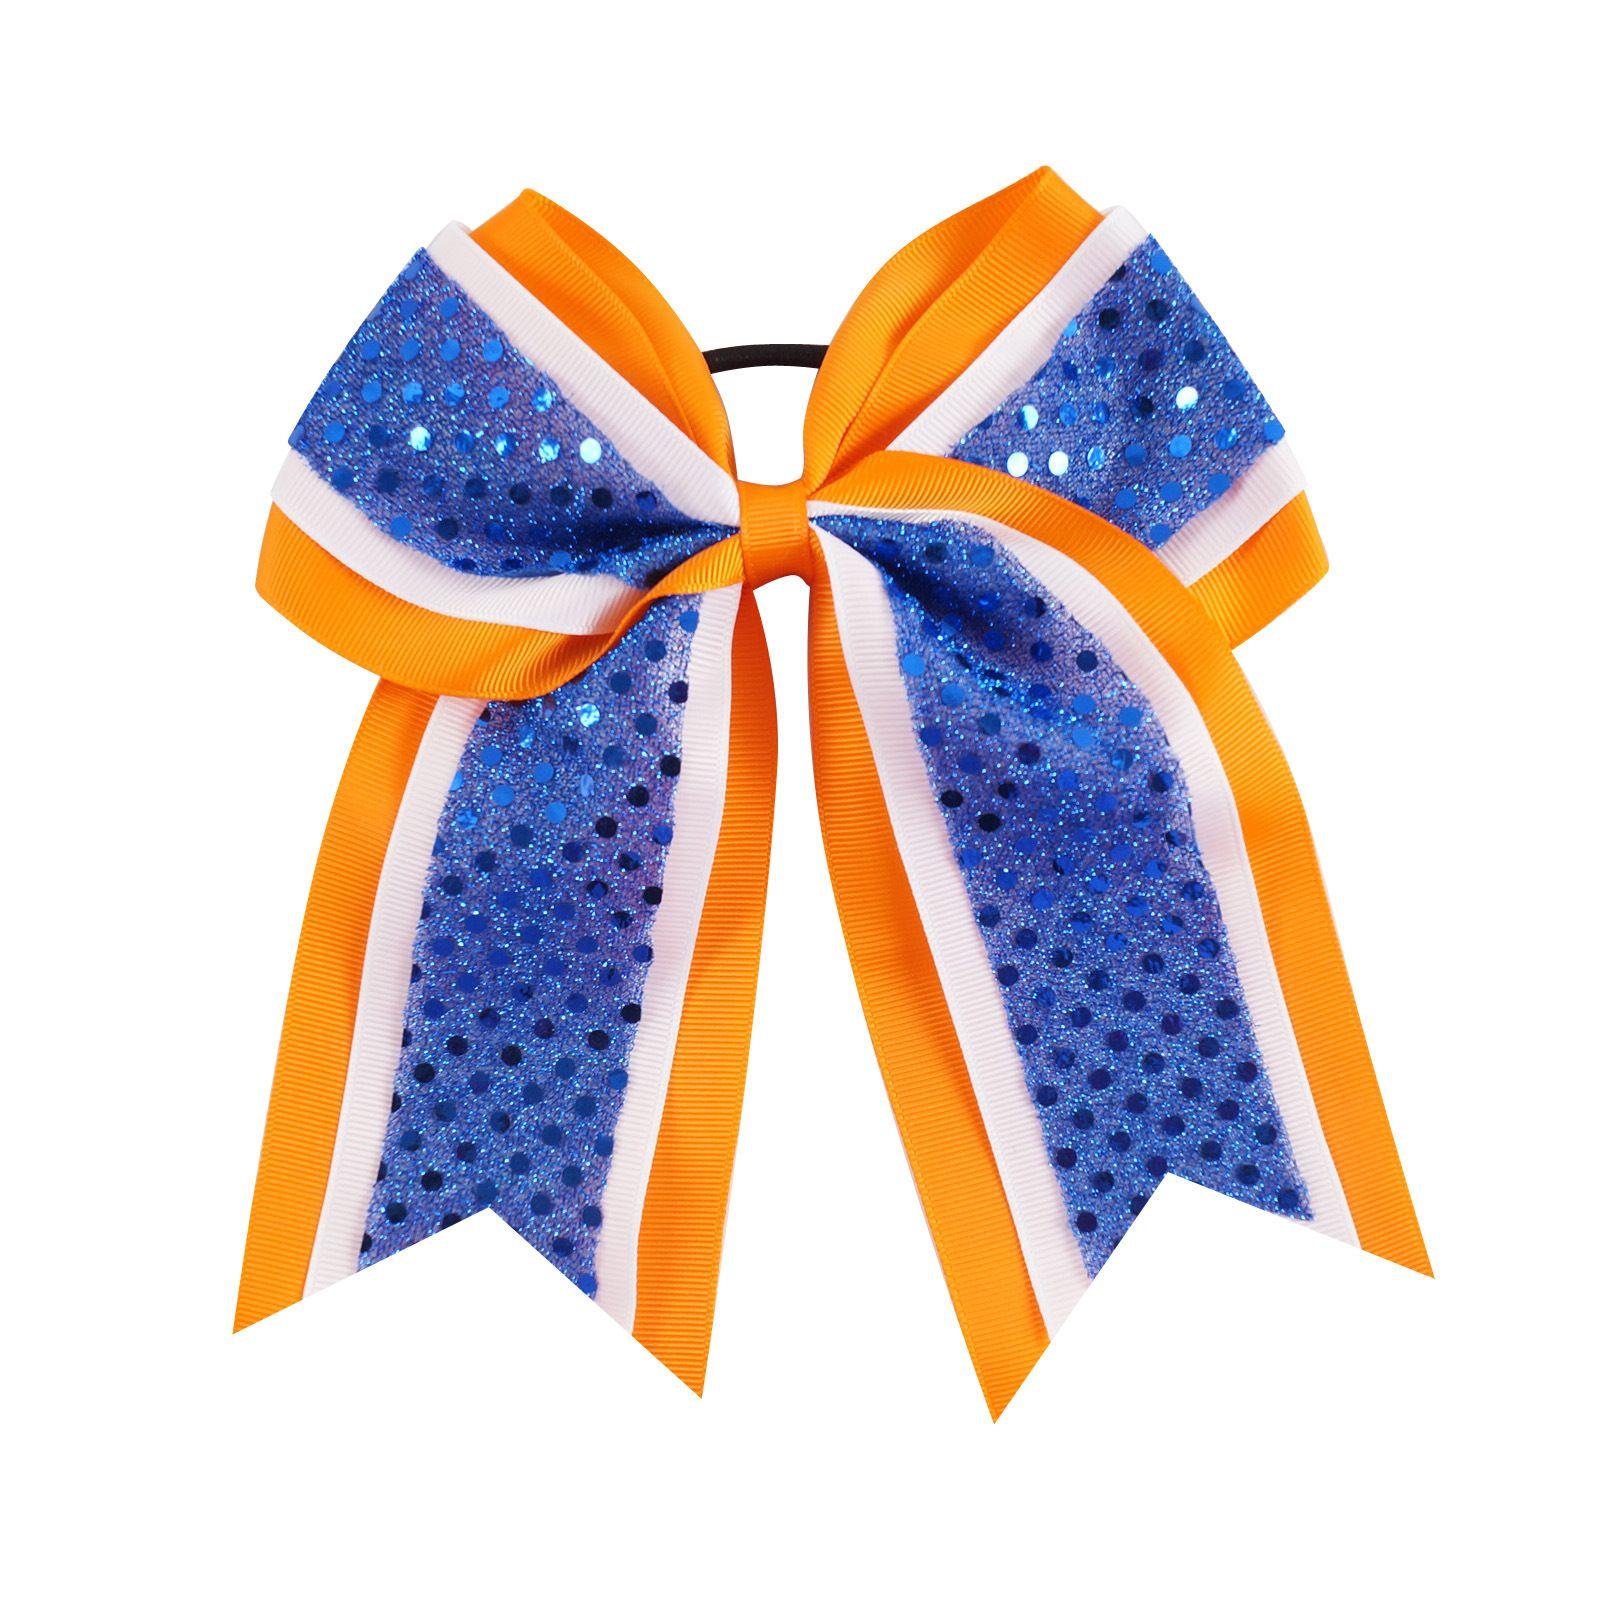 "7"" Softball Football Baseball Cheer Bows Handmade Ribbon Glitter Stiches with Ponytail Hair Holders for Cheerleading Girls Hairbands 473"